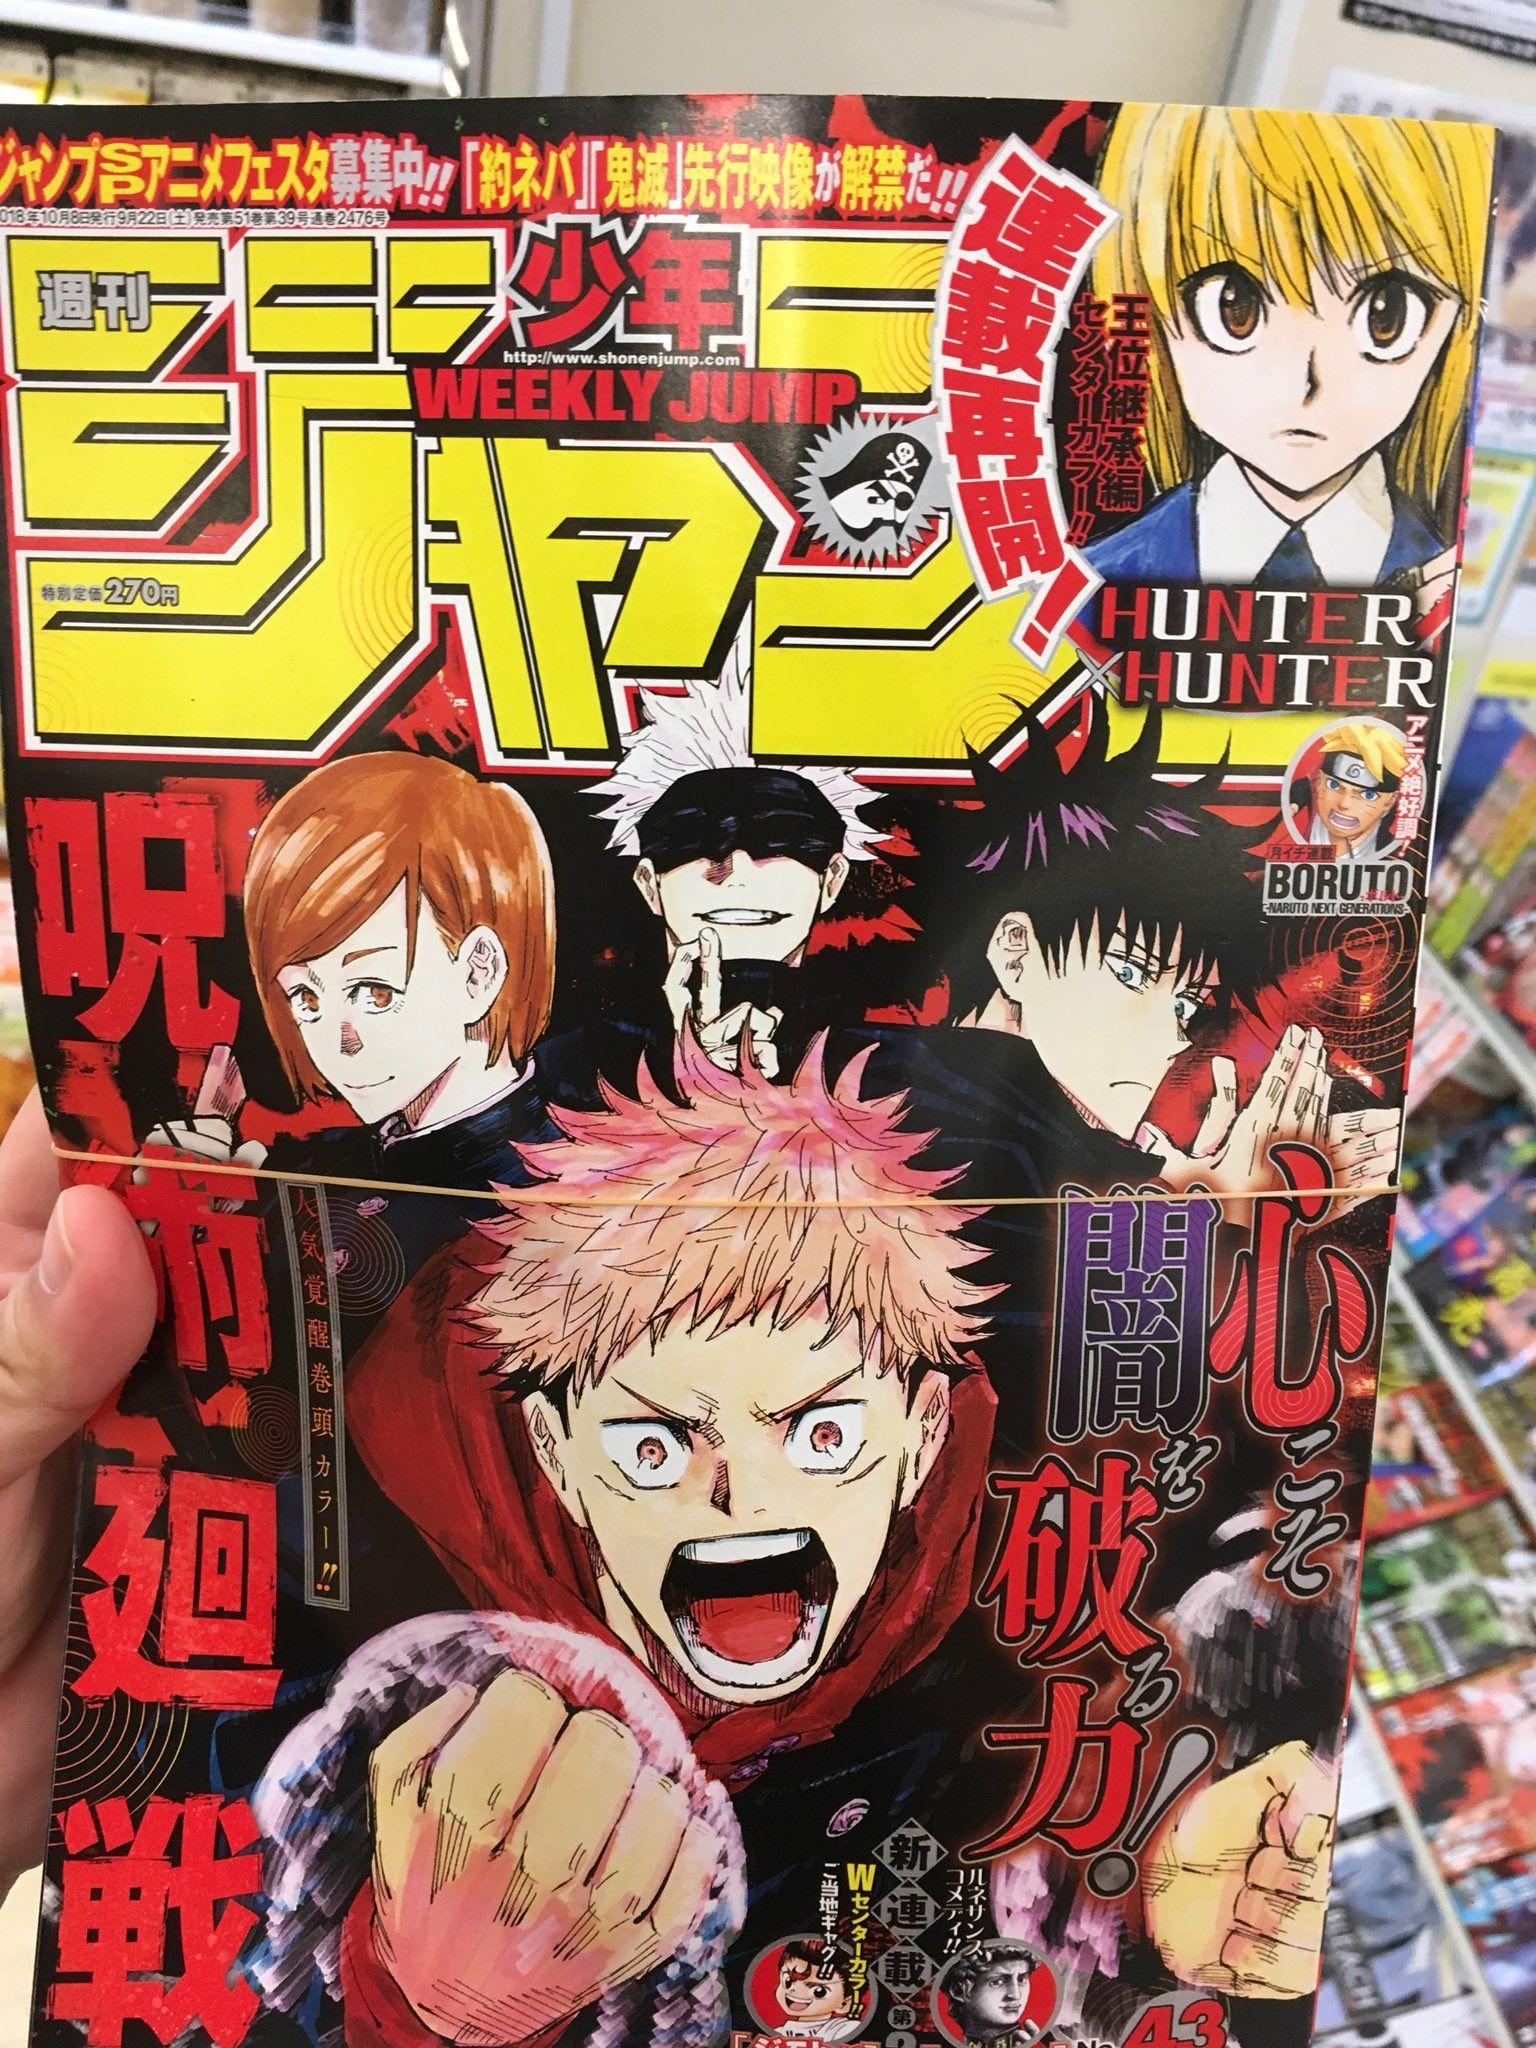 Manga OfficialCM2018 9/2930 on 呪術, 面白い漫画, 漫画